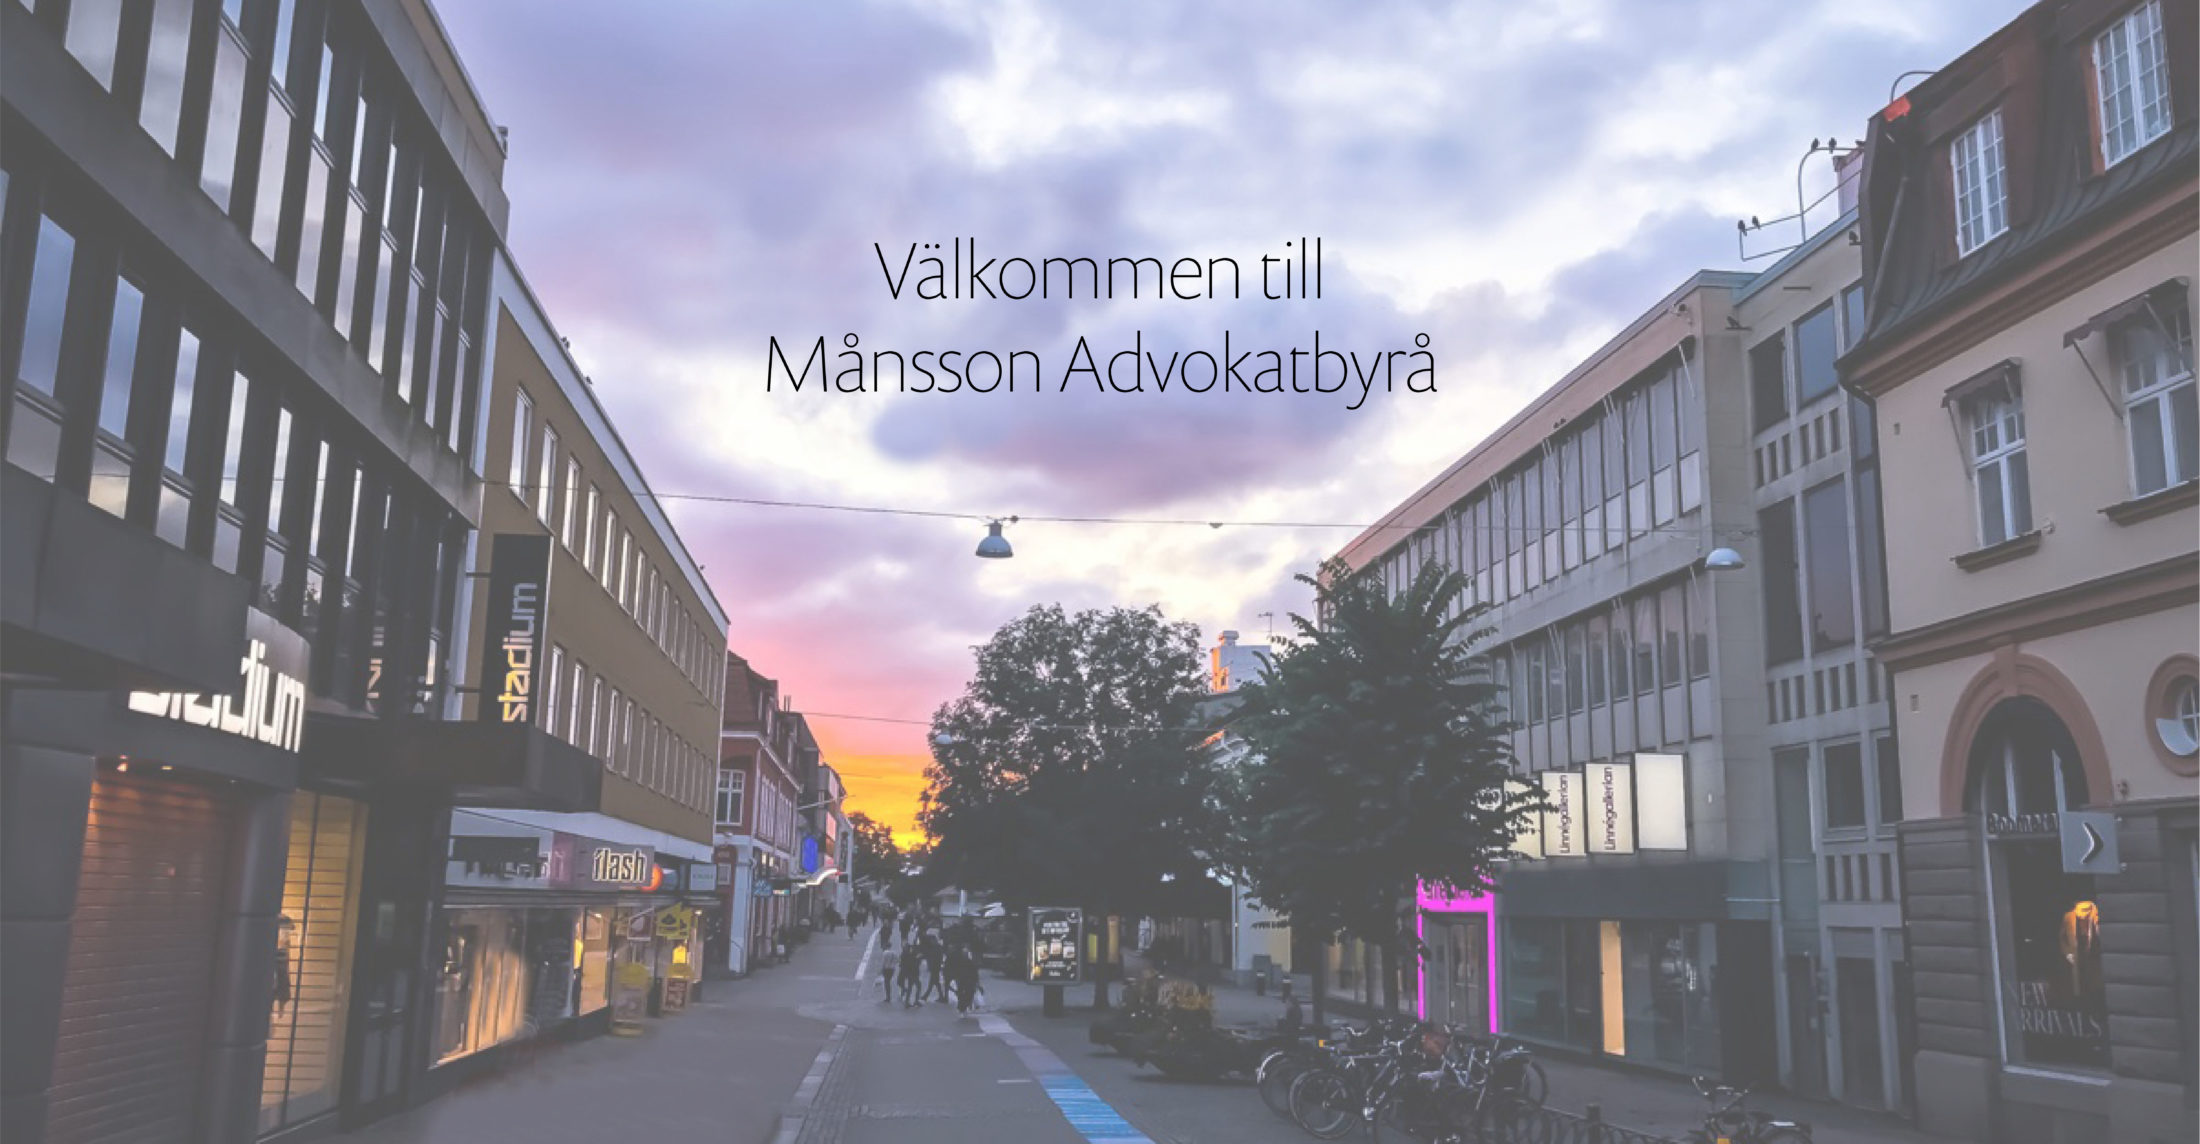 Månsson Advokatbyrå Växjö